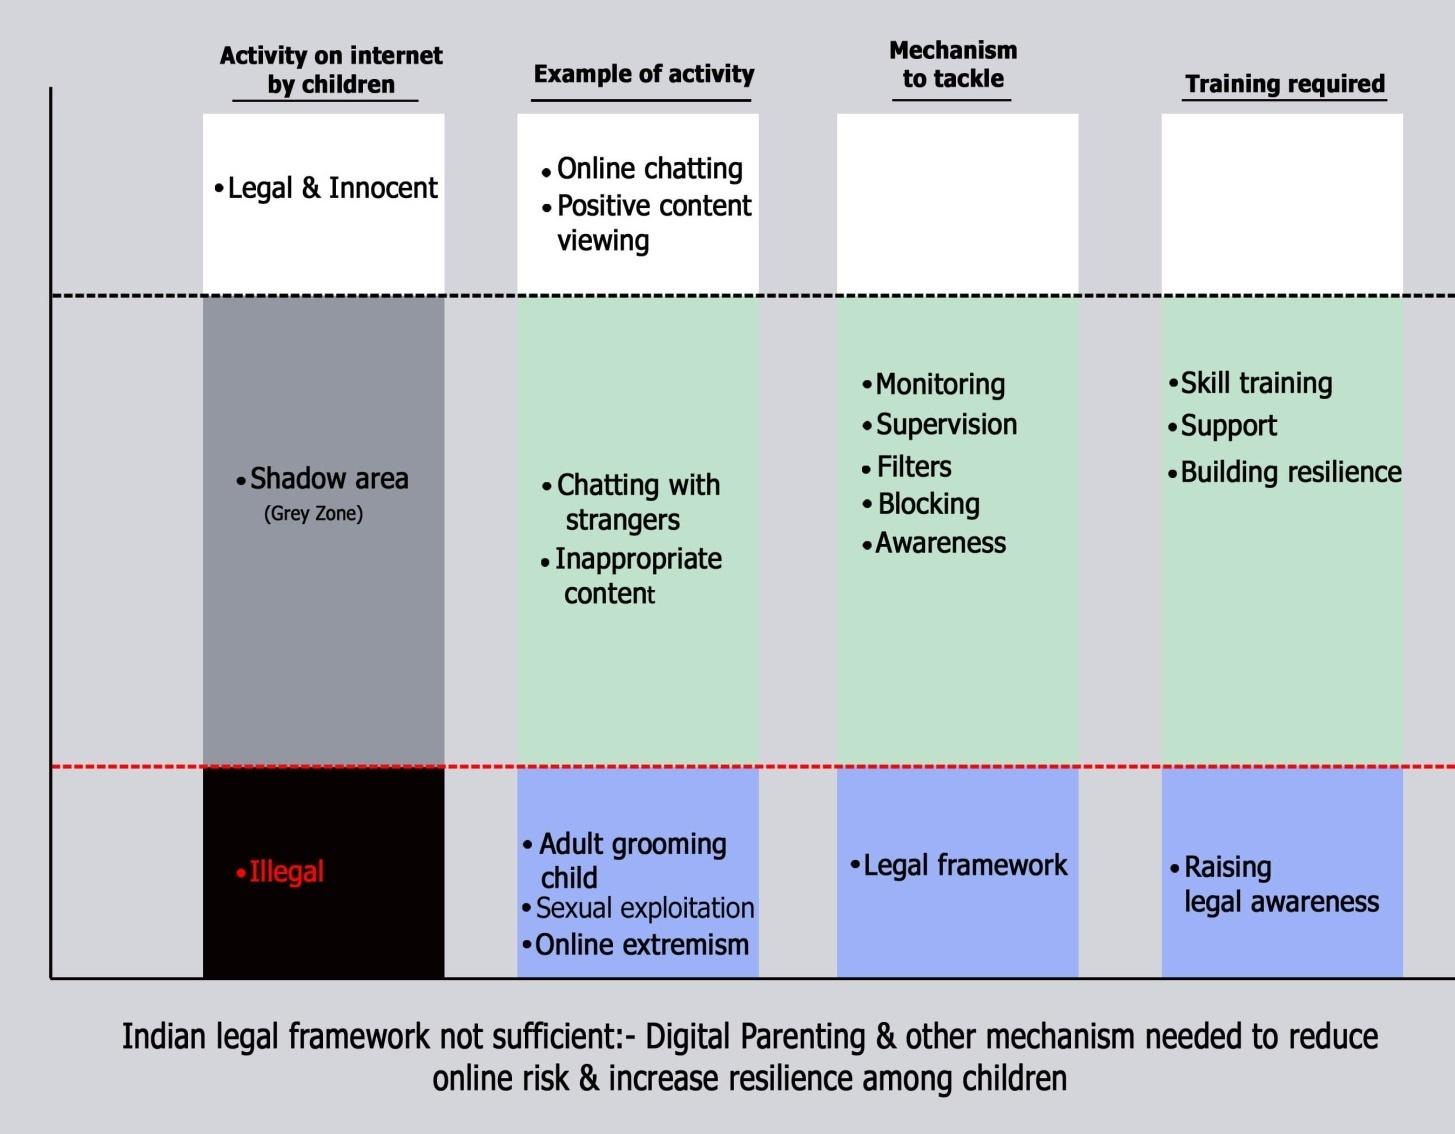 Understanding the legal framework